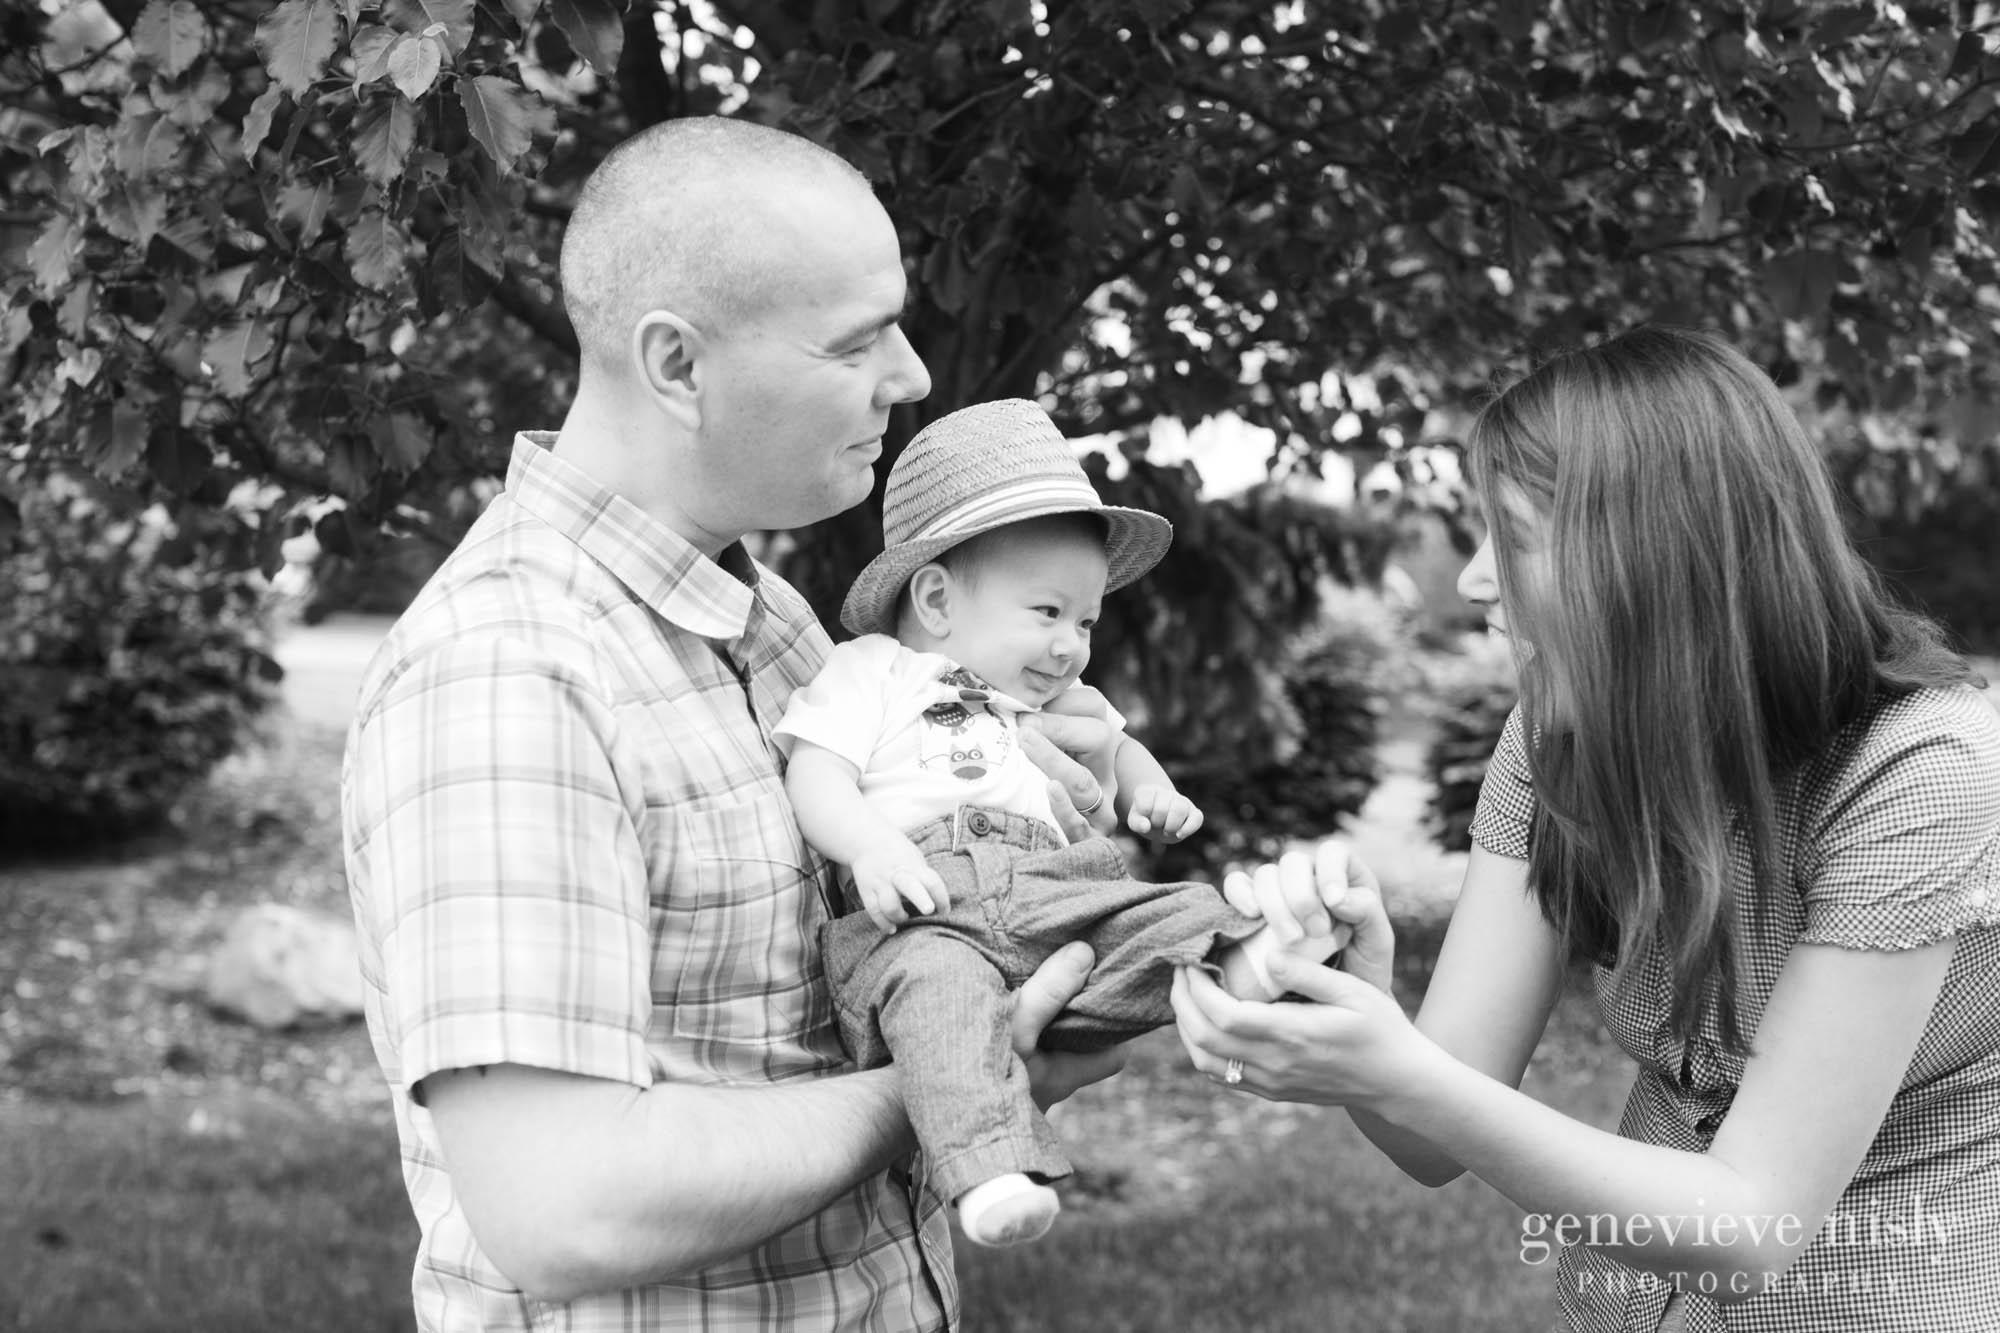 ruggles-004-akron-ohio-portrait-photographer-genevieve-nisly-photography